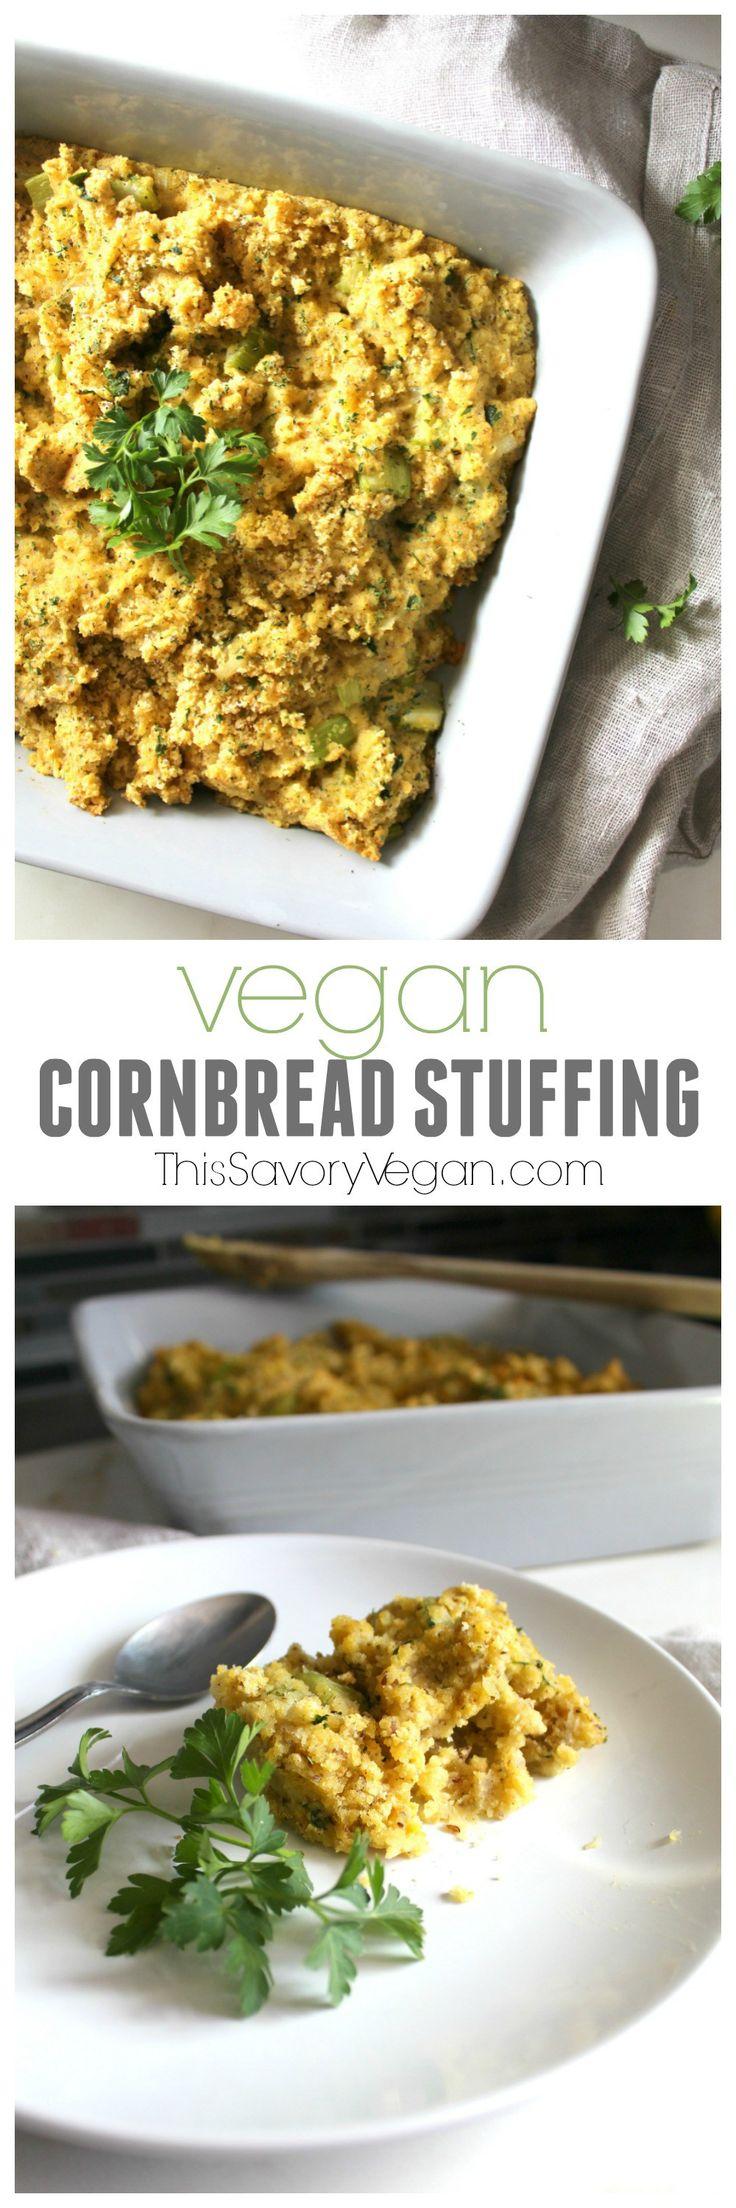 Have a delicious Thanksgiving with this Vegan Cornbread Dressing | ThisSavoryVegan.com